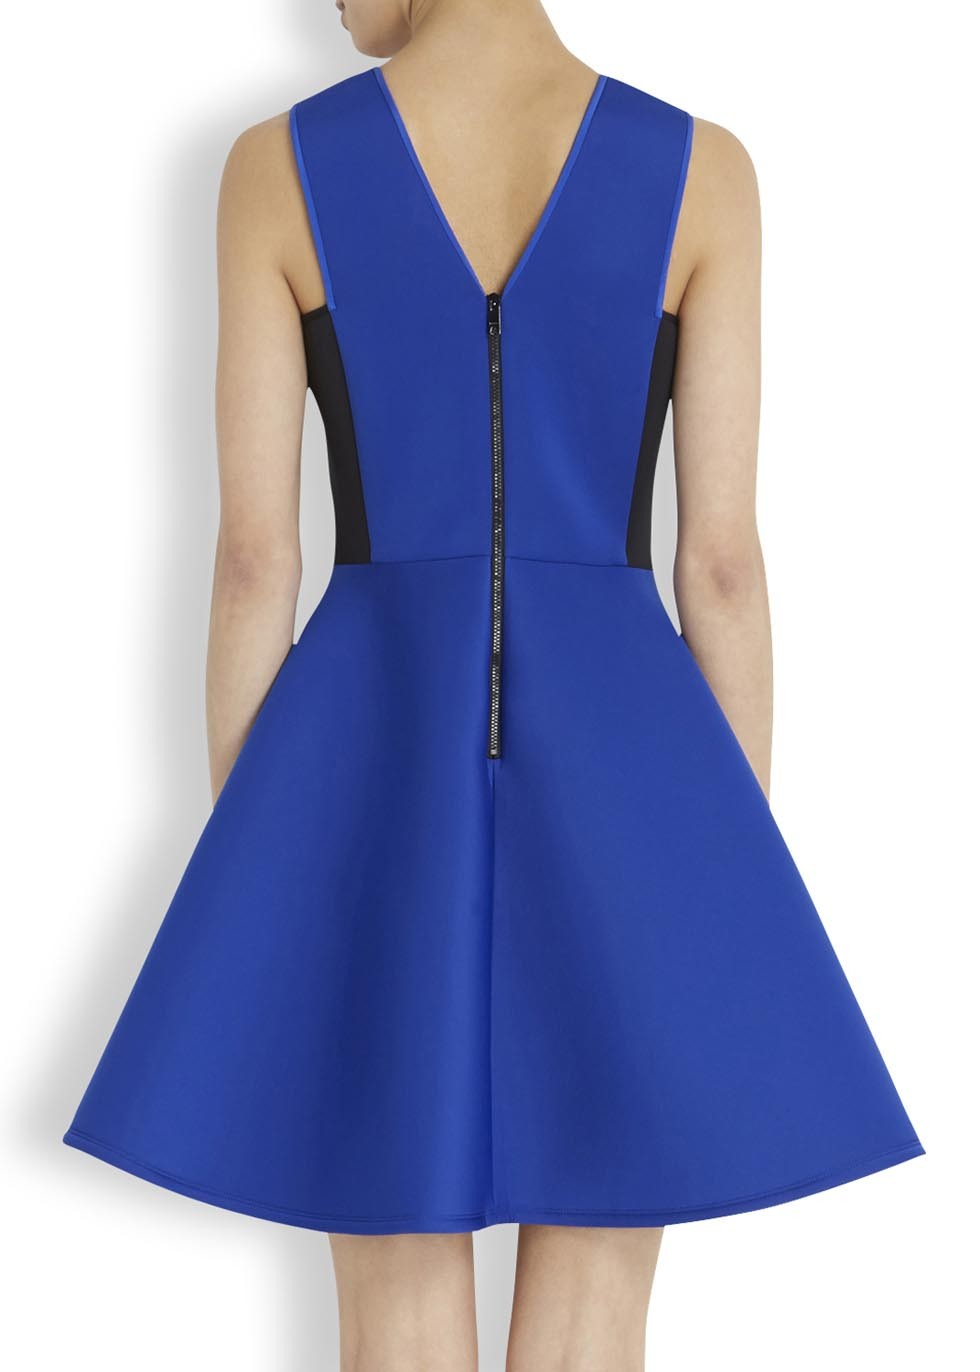 Dkny Blue And Black Flared Neoprene Dress Lyst